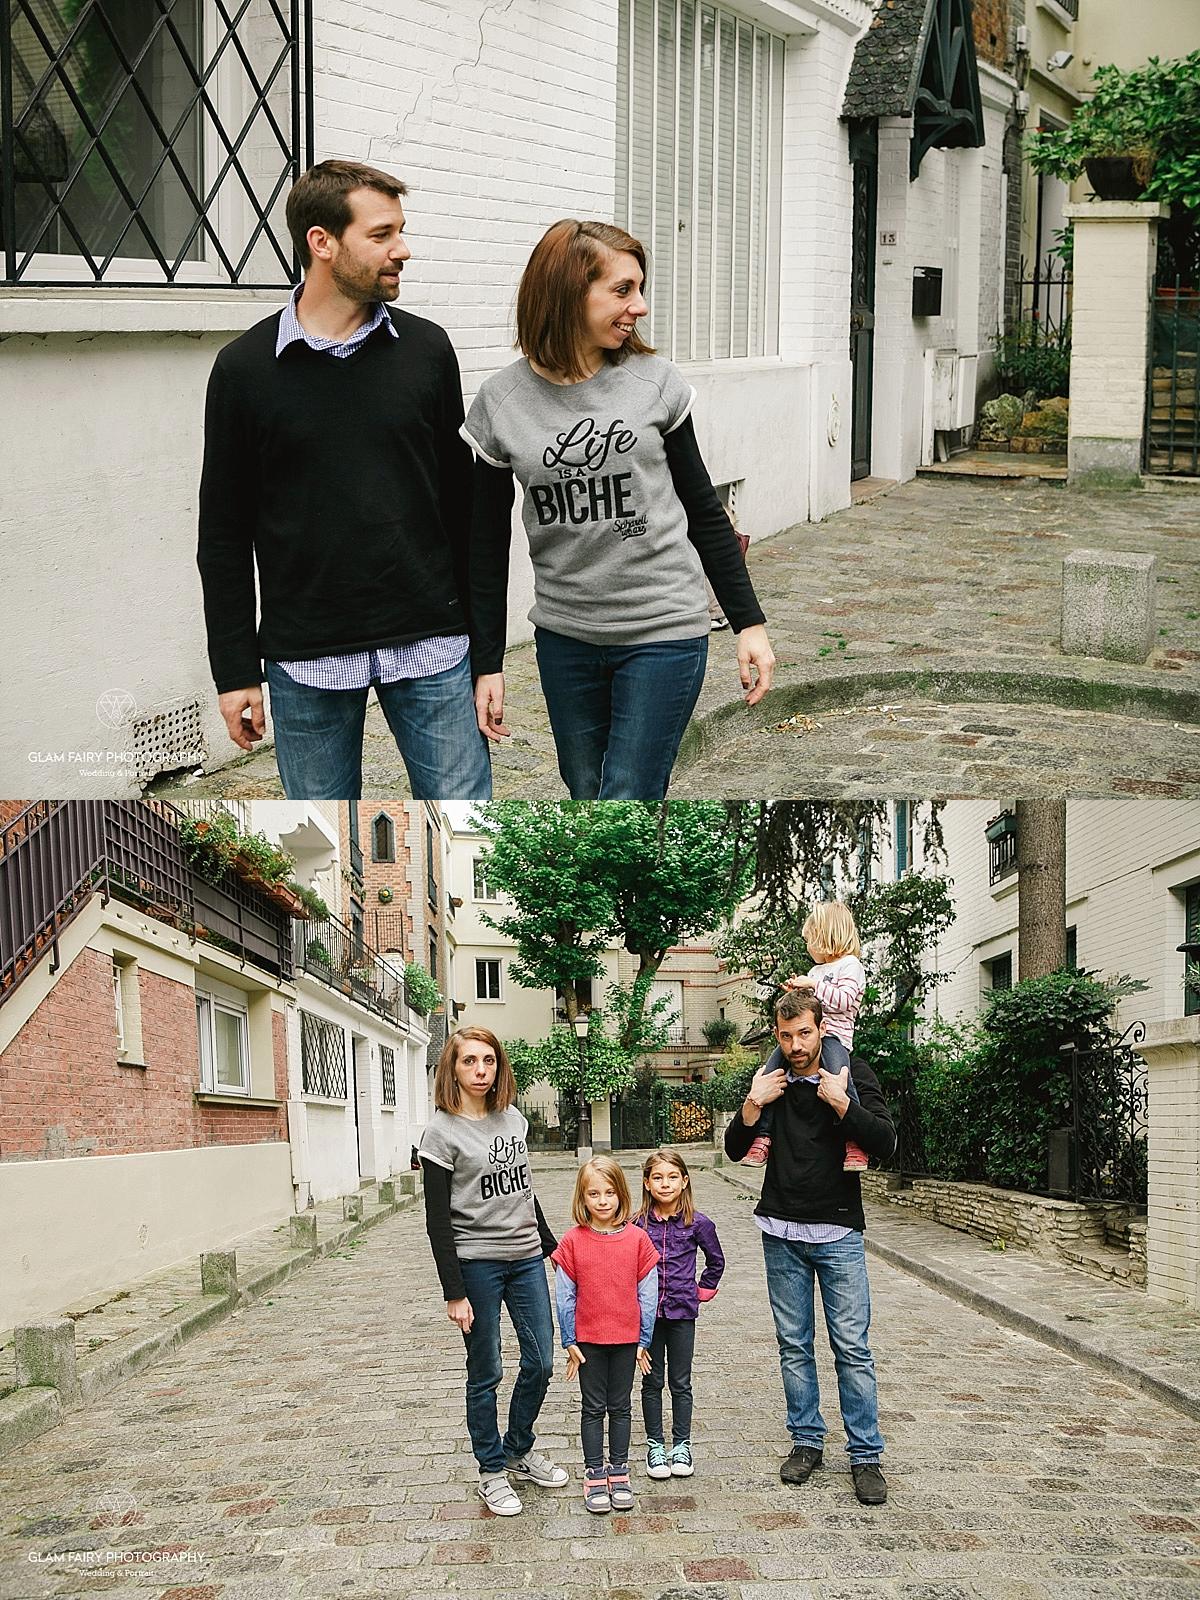 GlamFairyPhotography-séance-photo-famille-montmartre-virgnie_0002